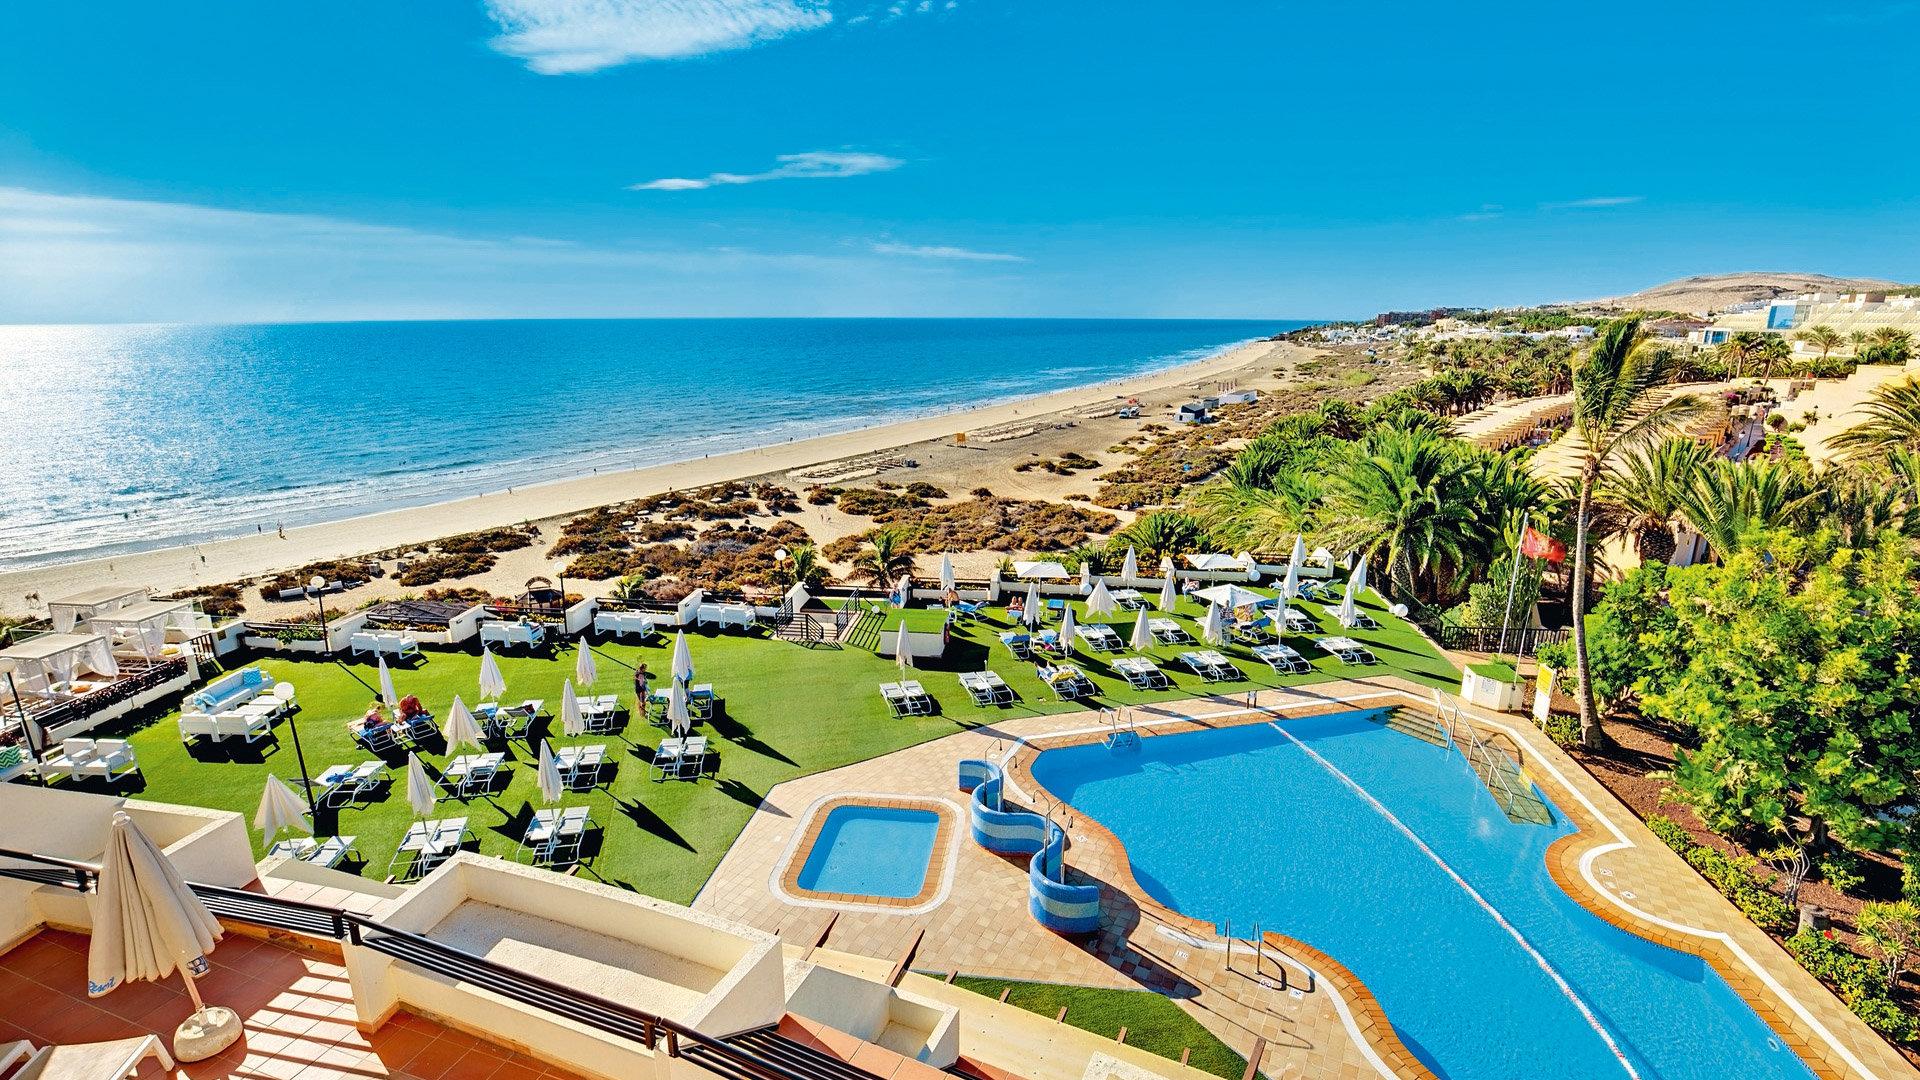 Viešbutis SBH CRYSTAL BEACH HOTEL & SUITES